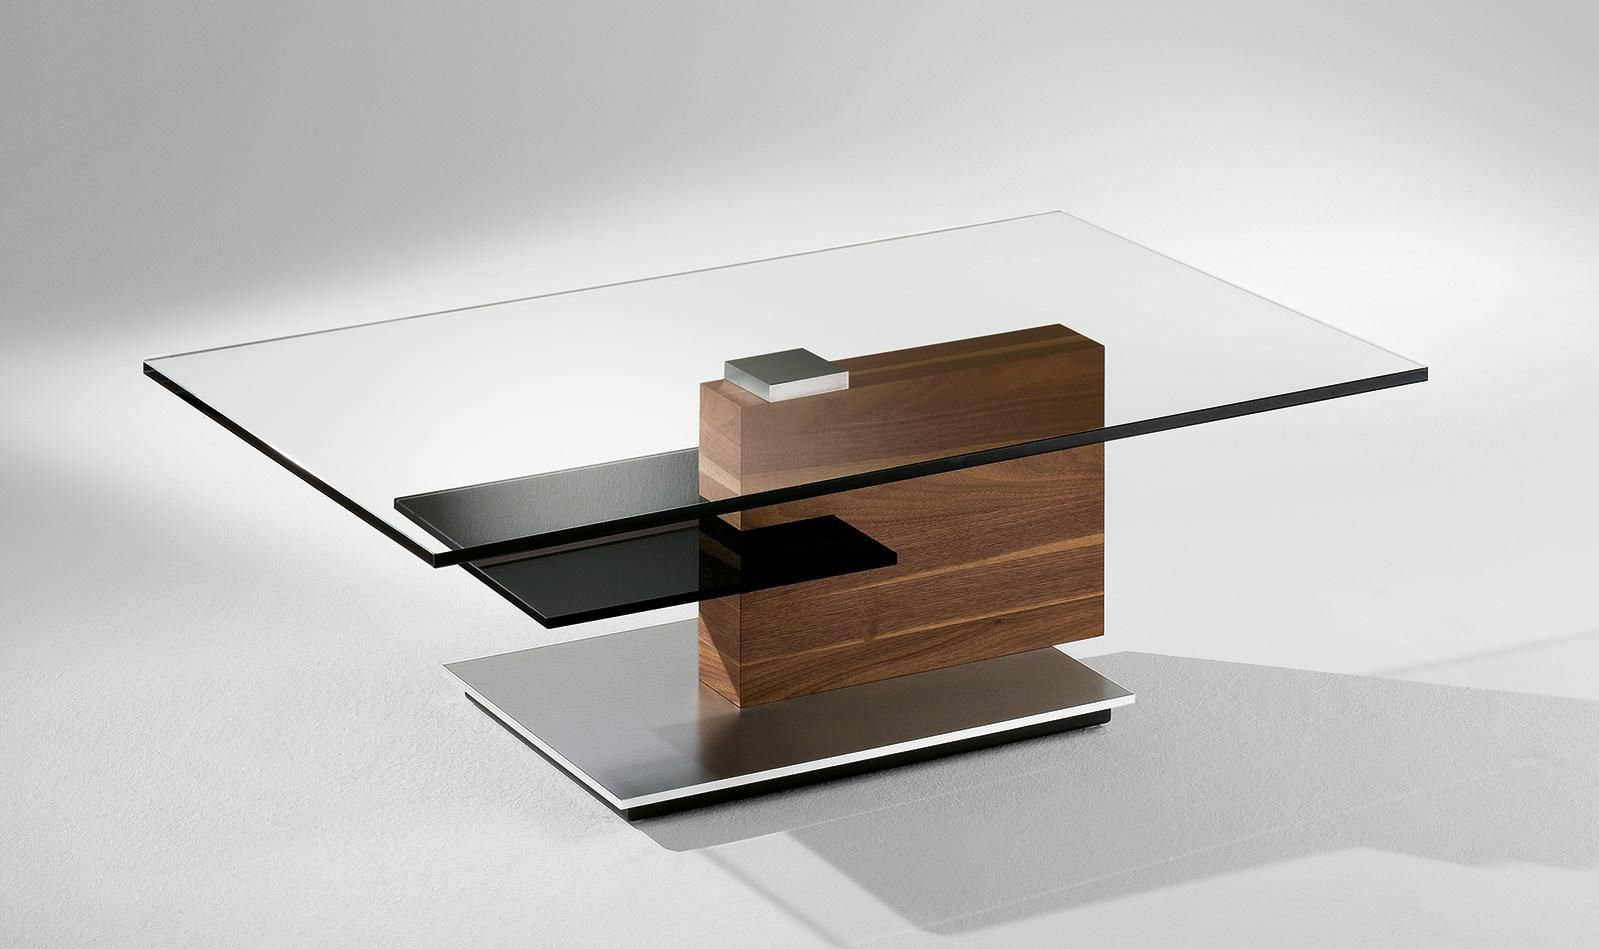 Couchtisch glas holz  Moderner Couchtisch / Holz / Glas / rechteckig - 4423 - Alfons ...